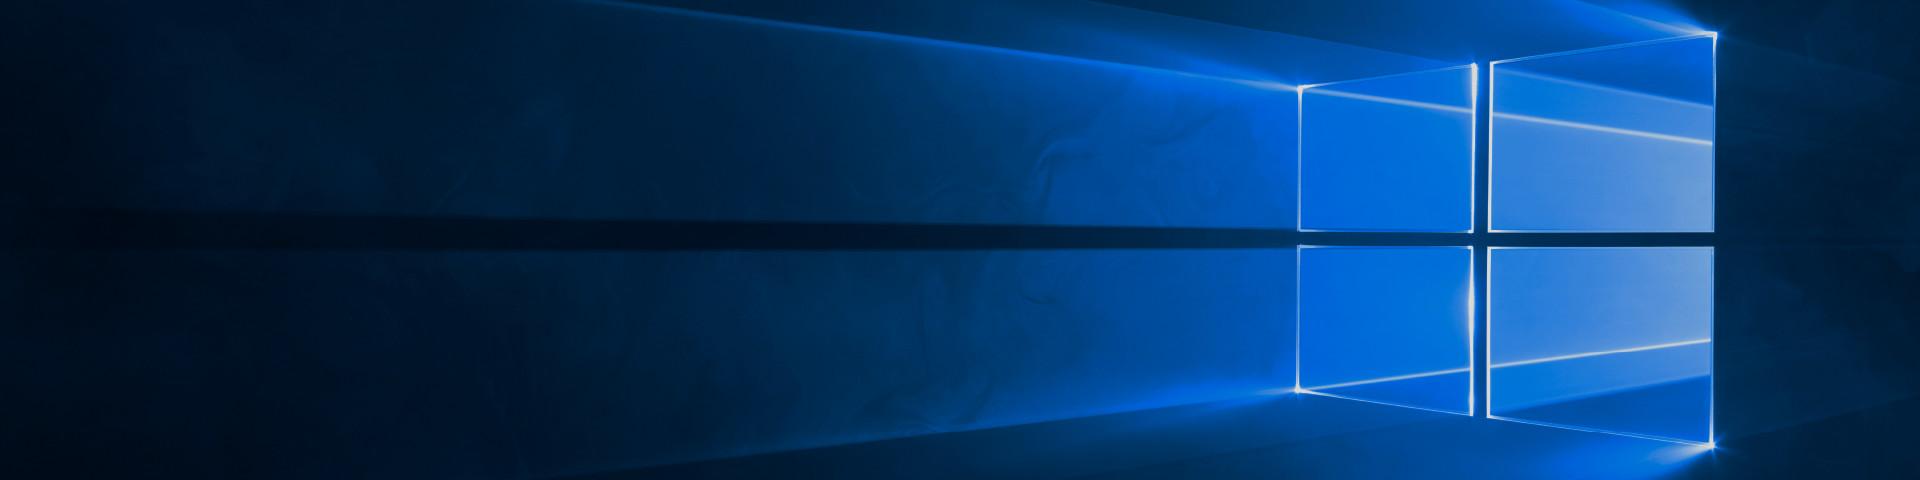 Windows 10이 출시되었으며 무료로 다운로드 가능합니다.*